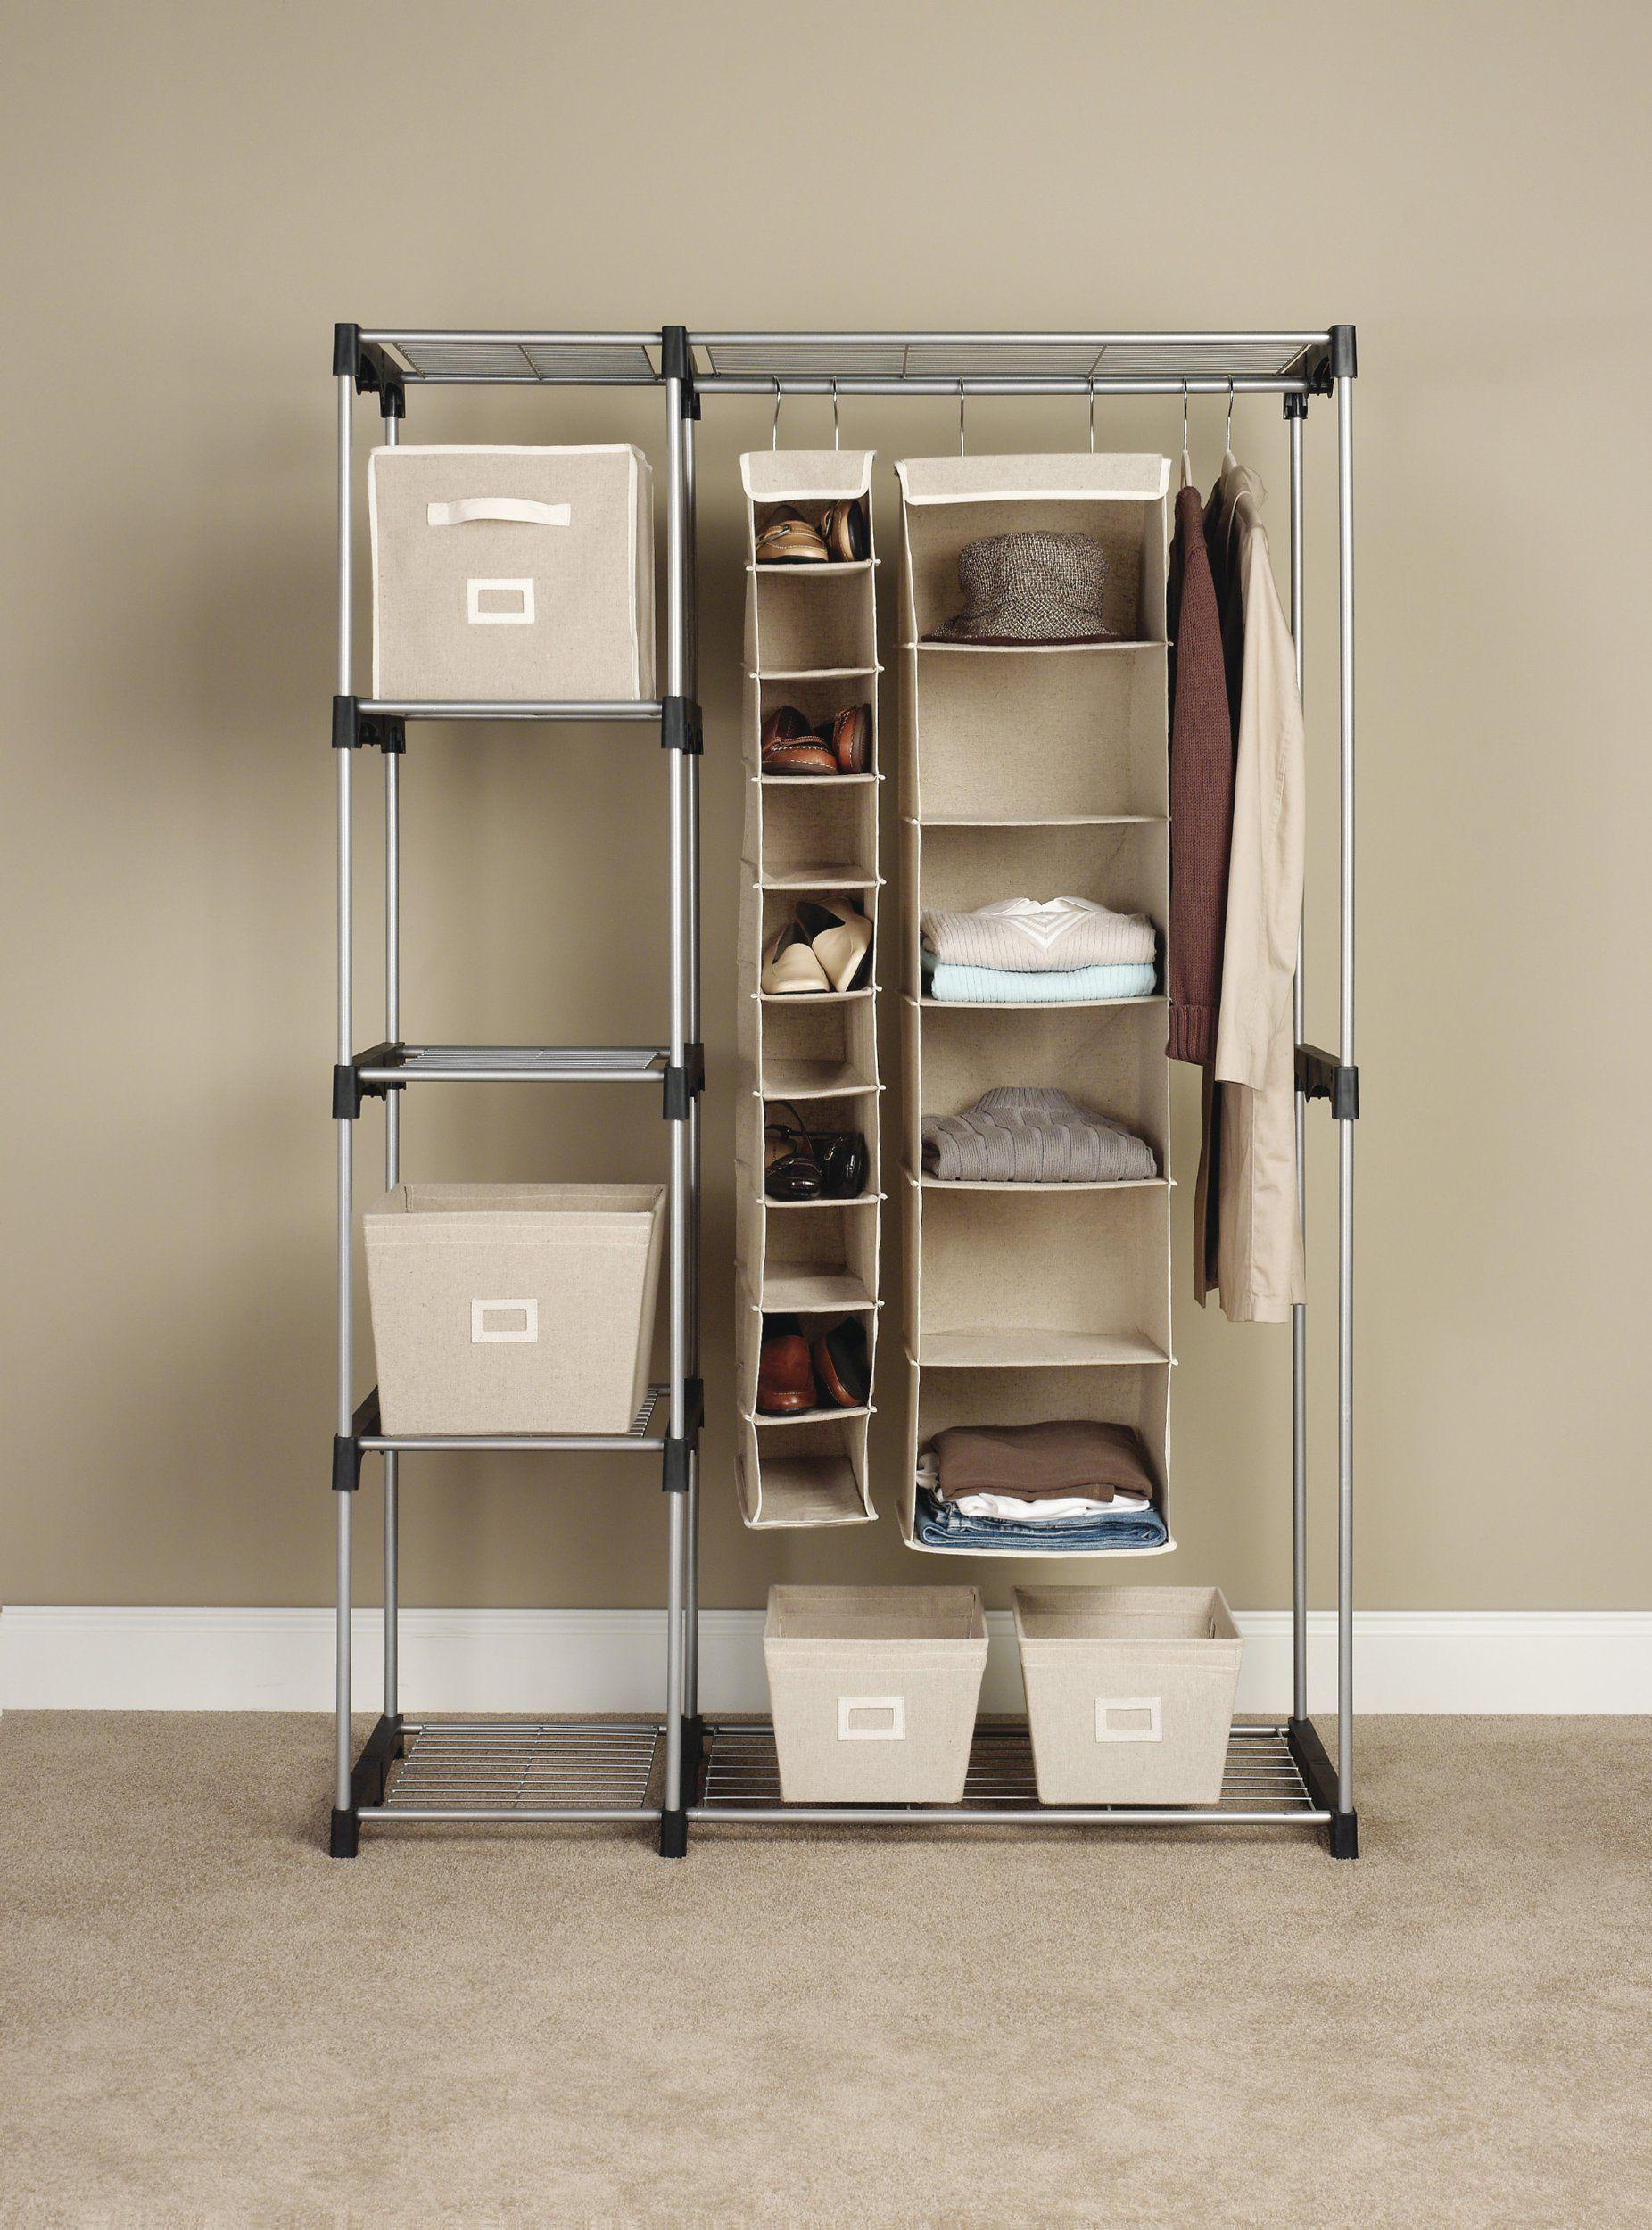 Amazon Com Whitmor 6779 3044 Double Rod Closet Silver Closet Storage And Organization Sys Storage Closet Organization Standing Closet Free Standing Closet